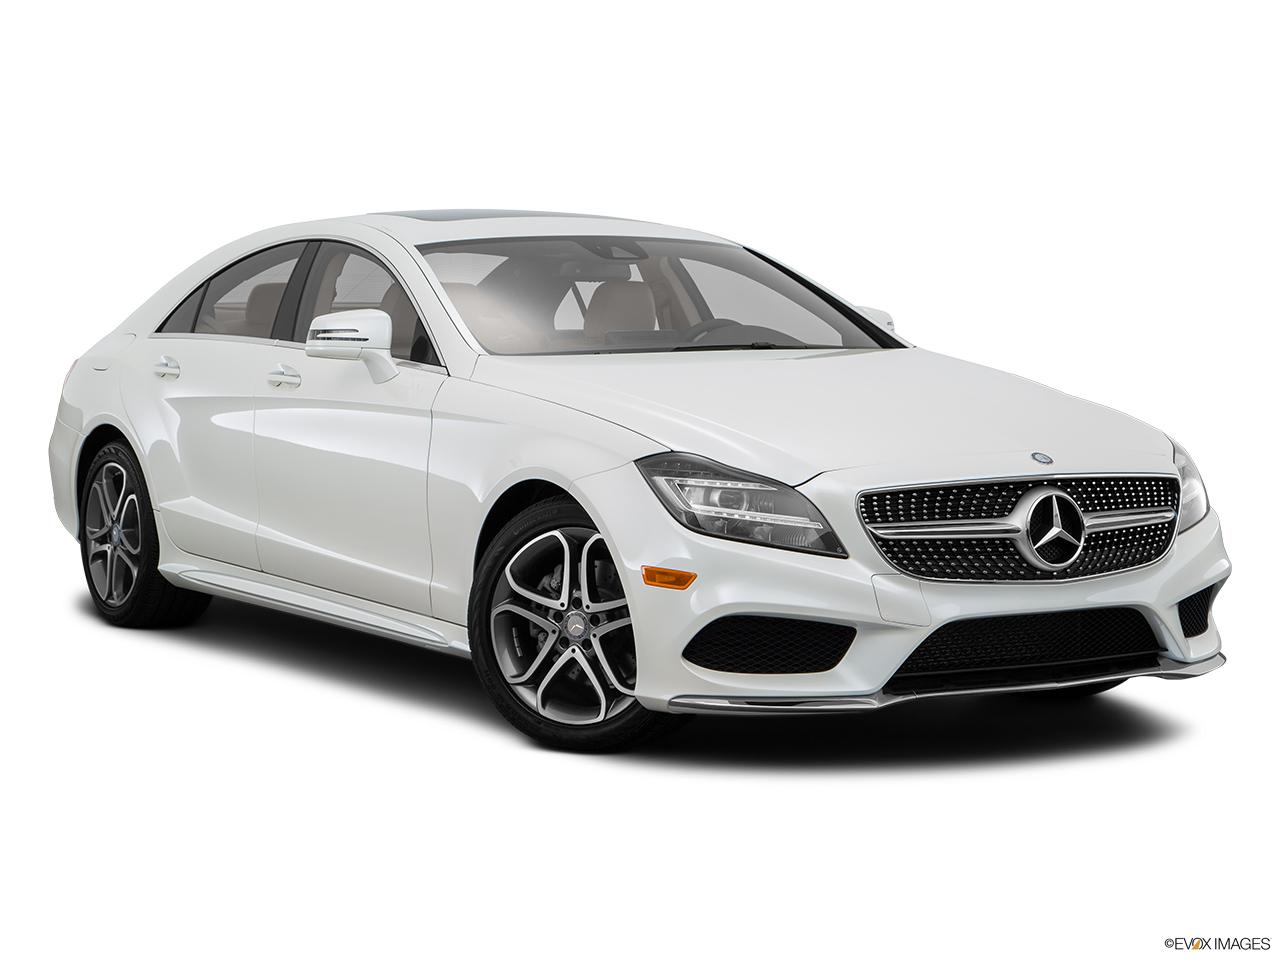 Car pictures list for mercedes benz cls class 2016 cls 400 for Mercedes benz payment estimator